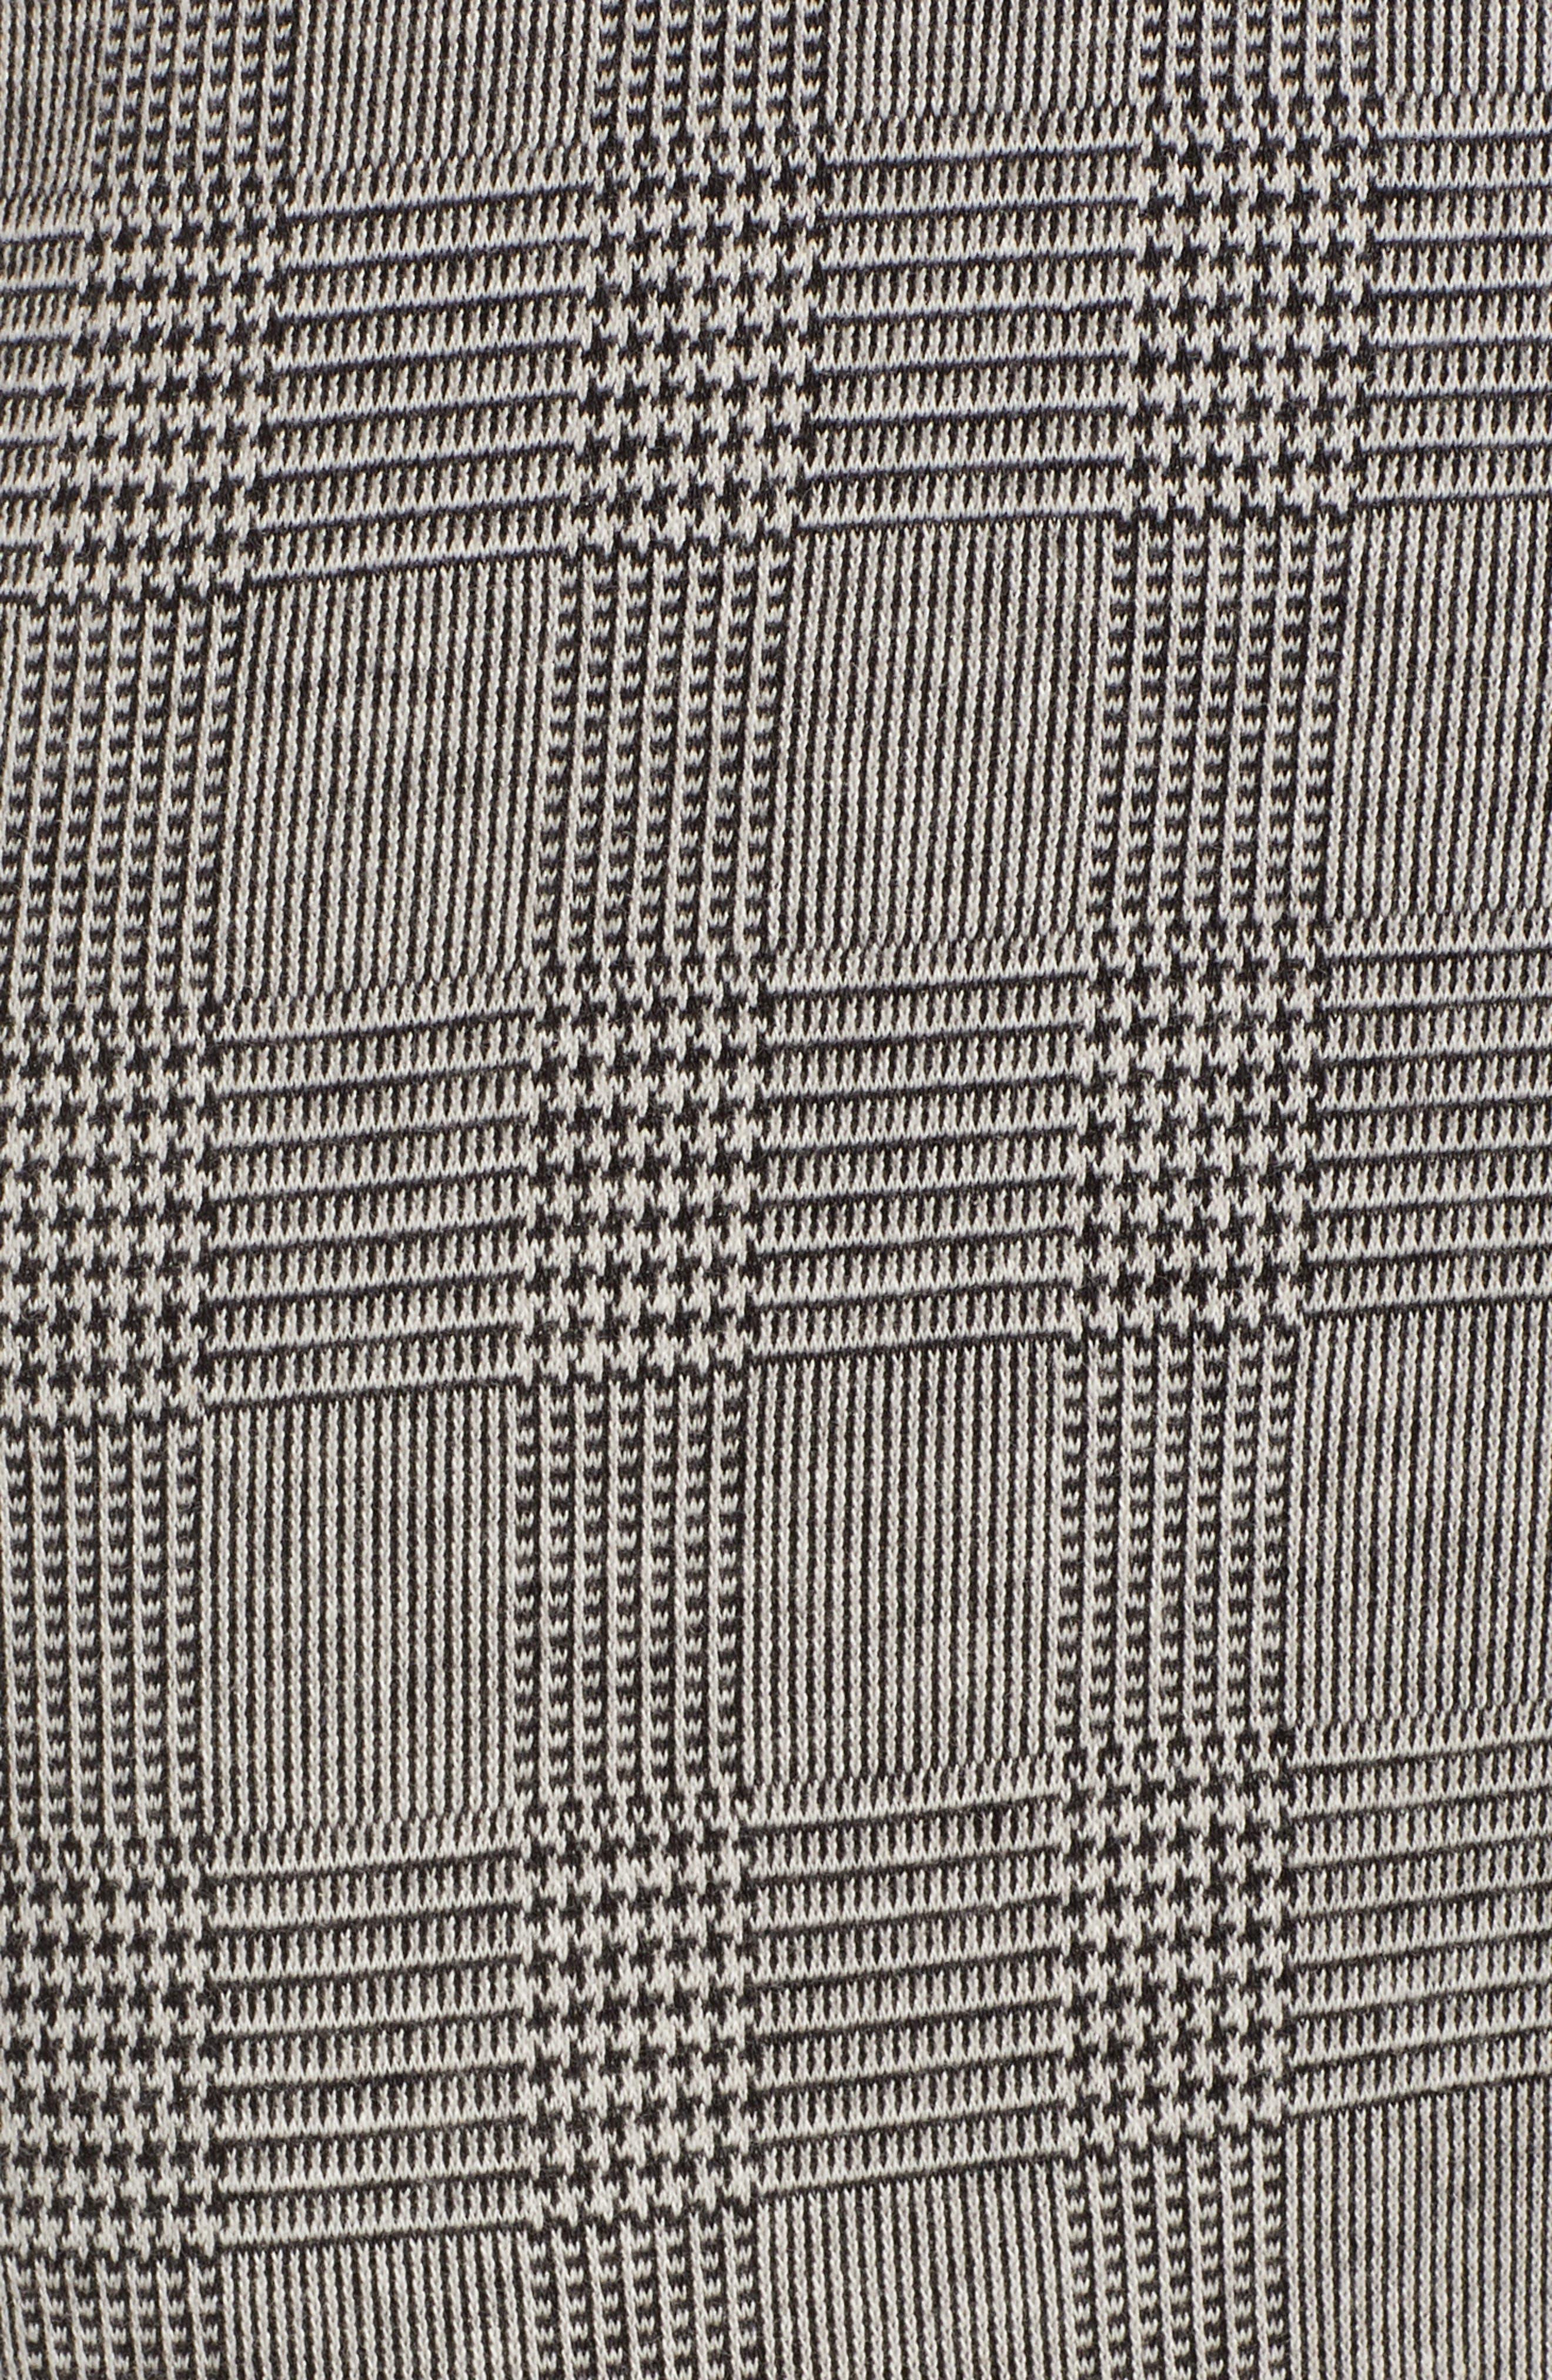 Plaid Leggings,                             Alternate thumbnail 6, color,                             001